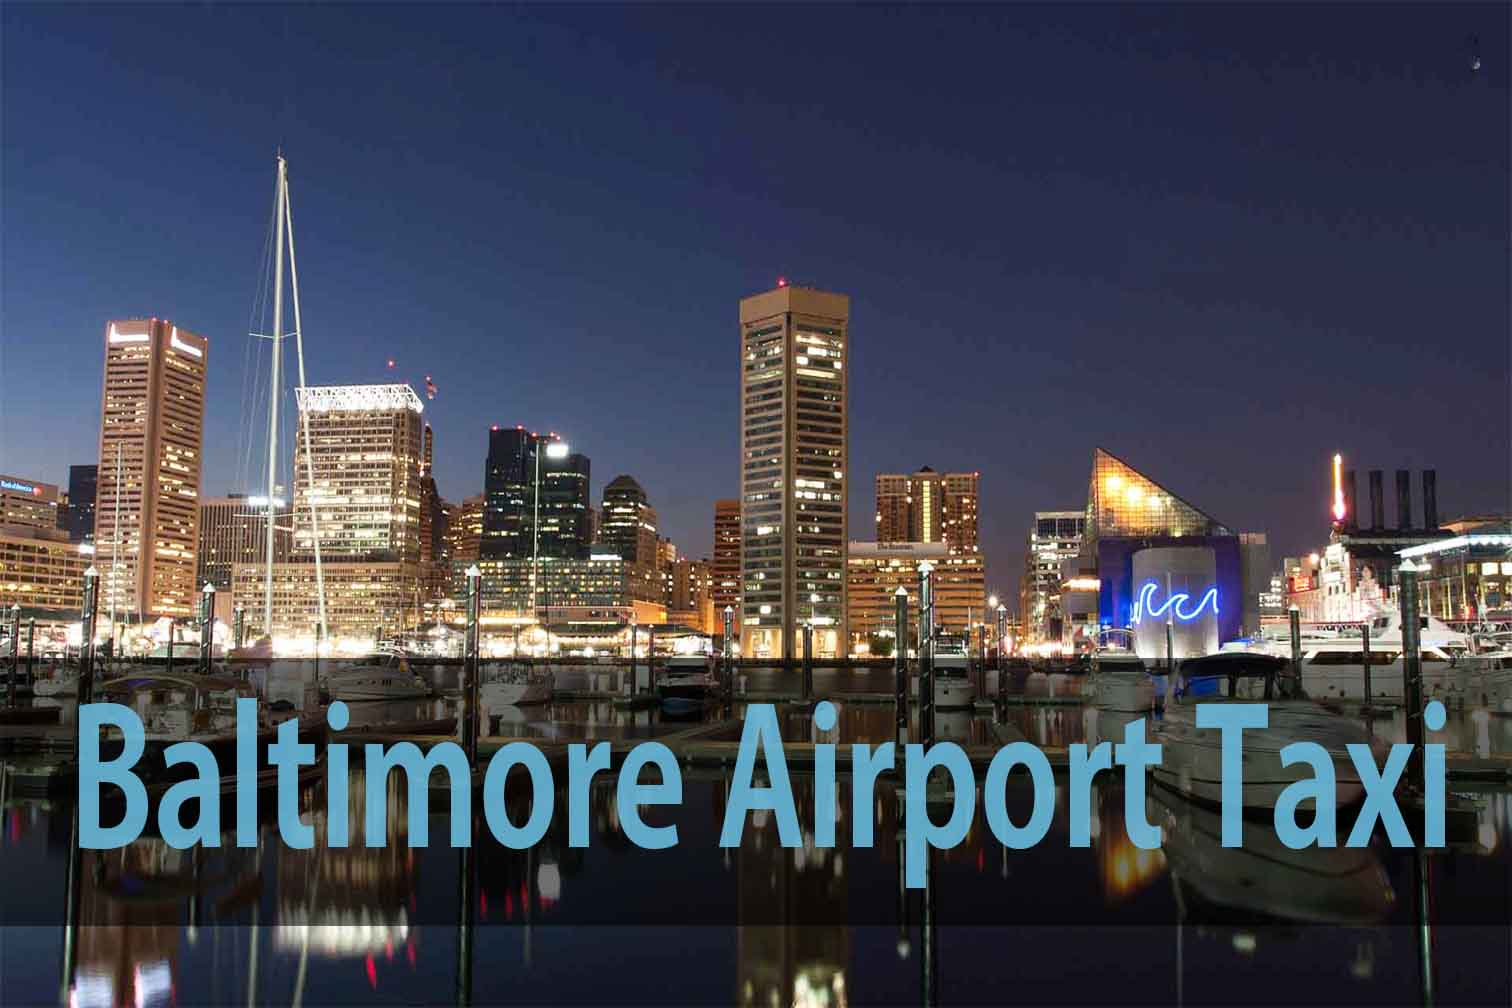 Baltimore airport taxi